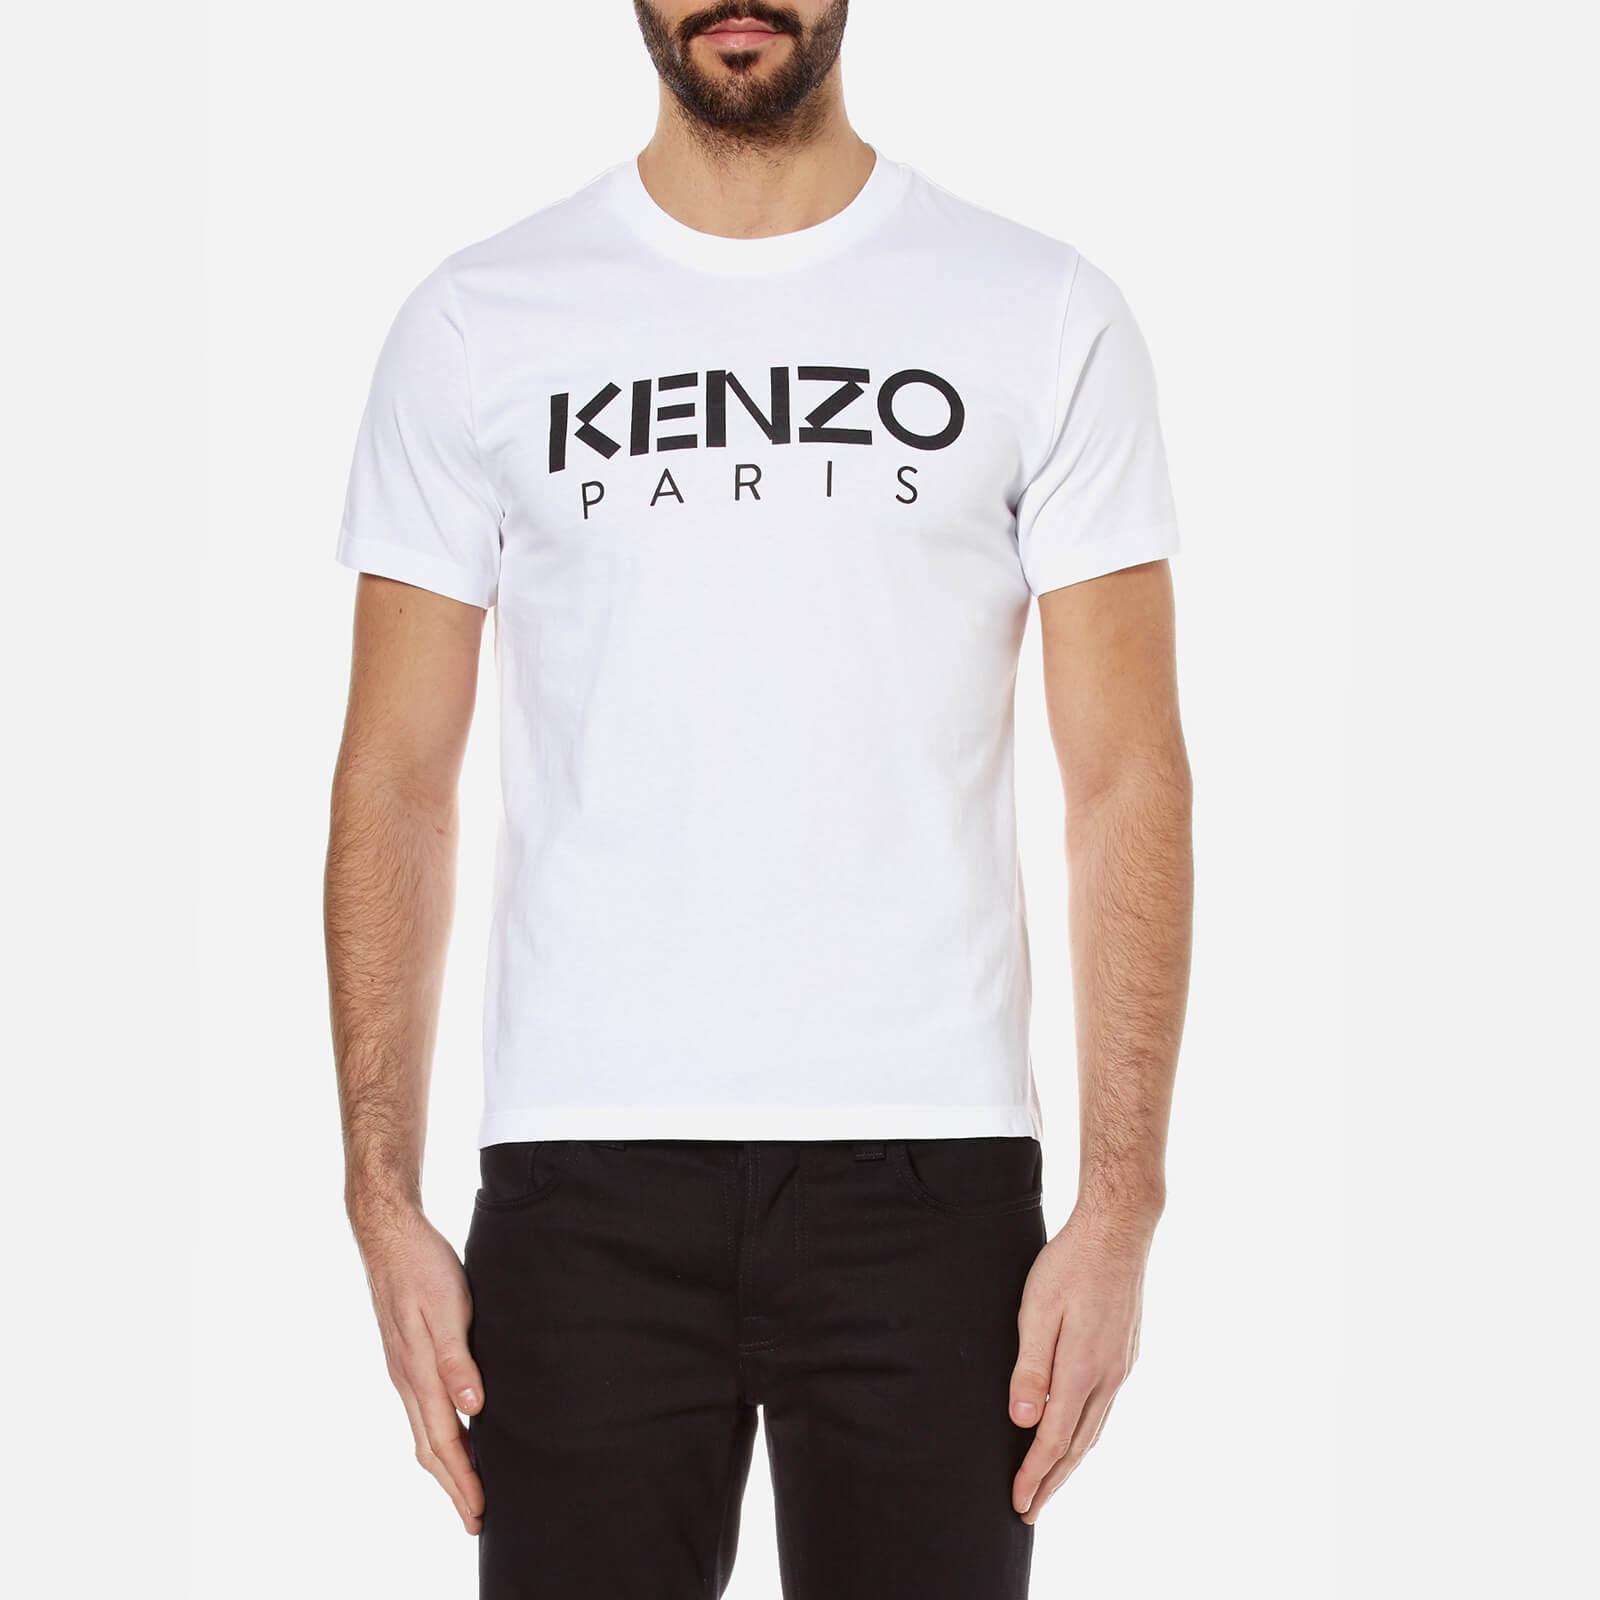 b7d38582 KENZO Men's Kenzo Paris Logo T-Shirt - White - Free UK Delivery over £50